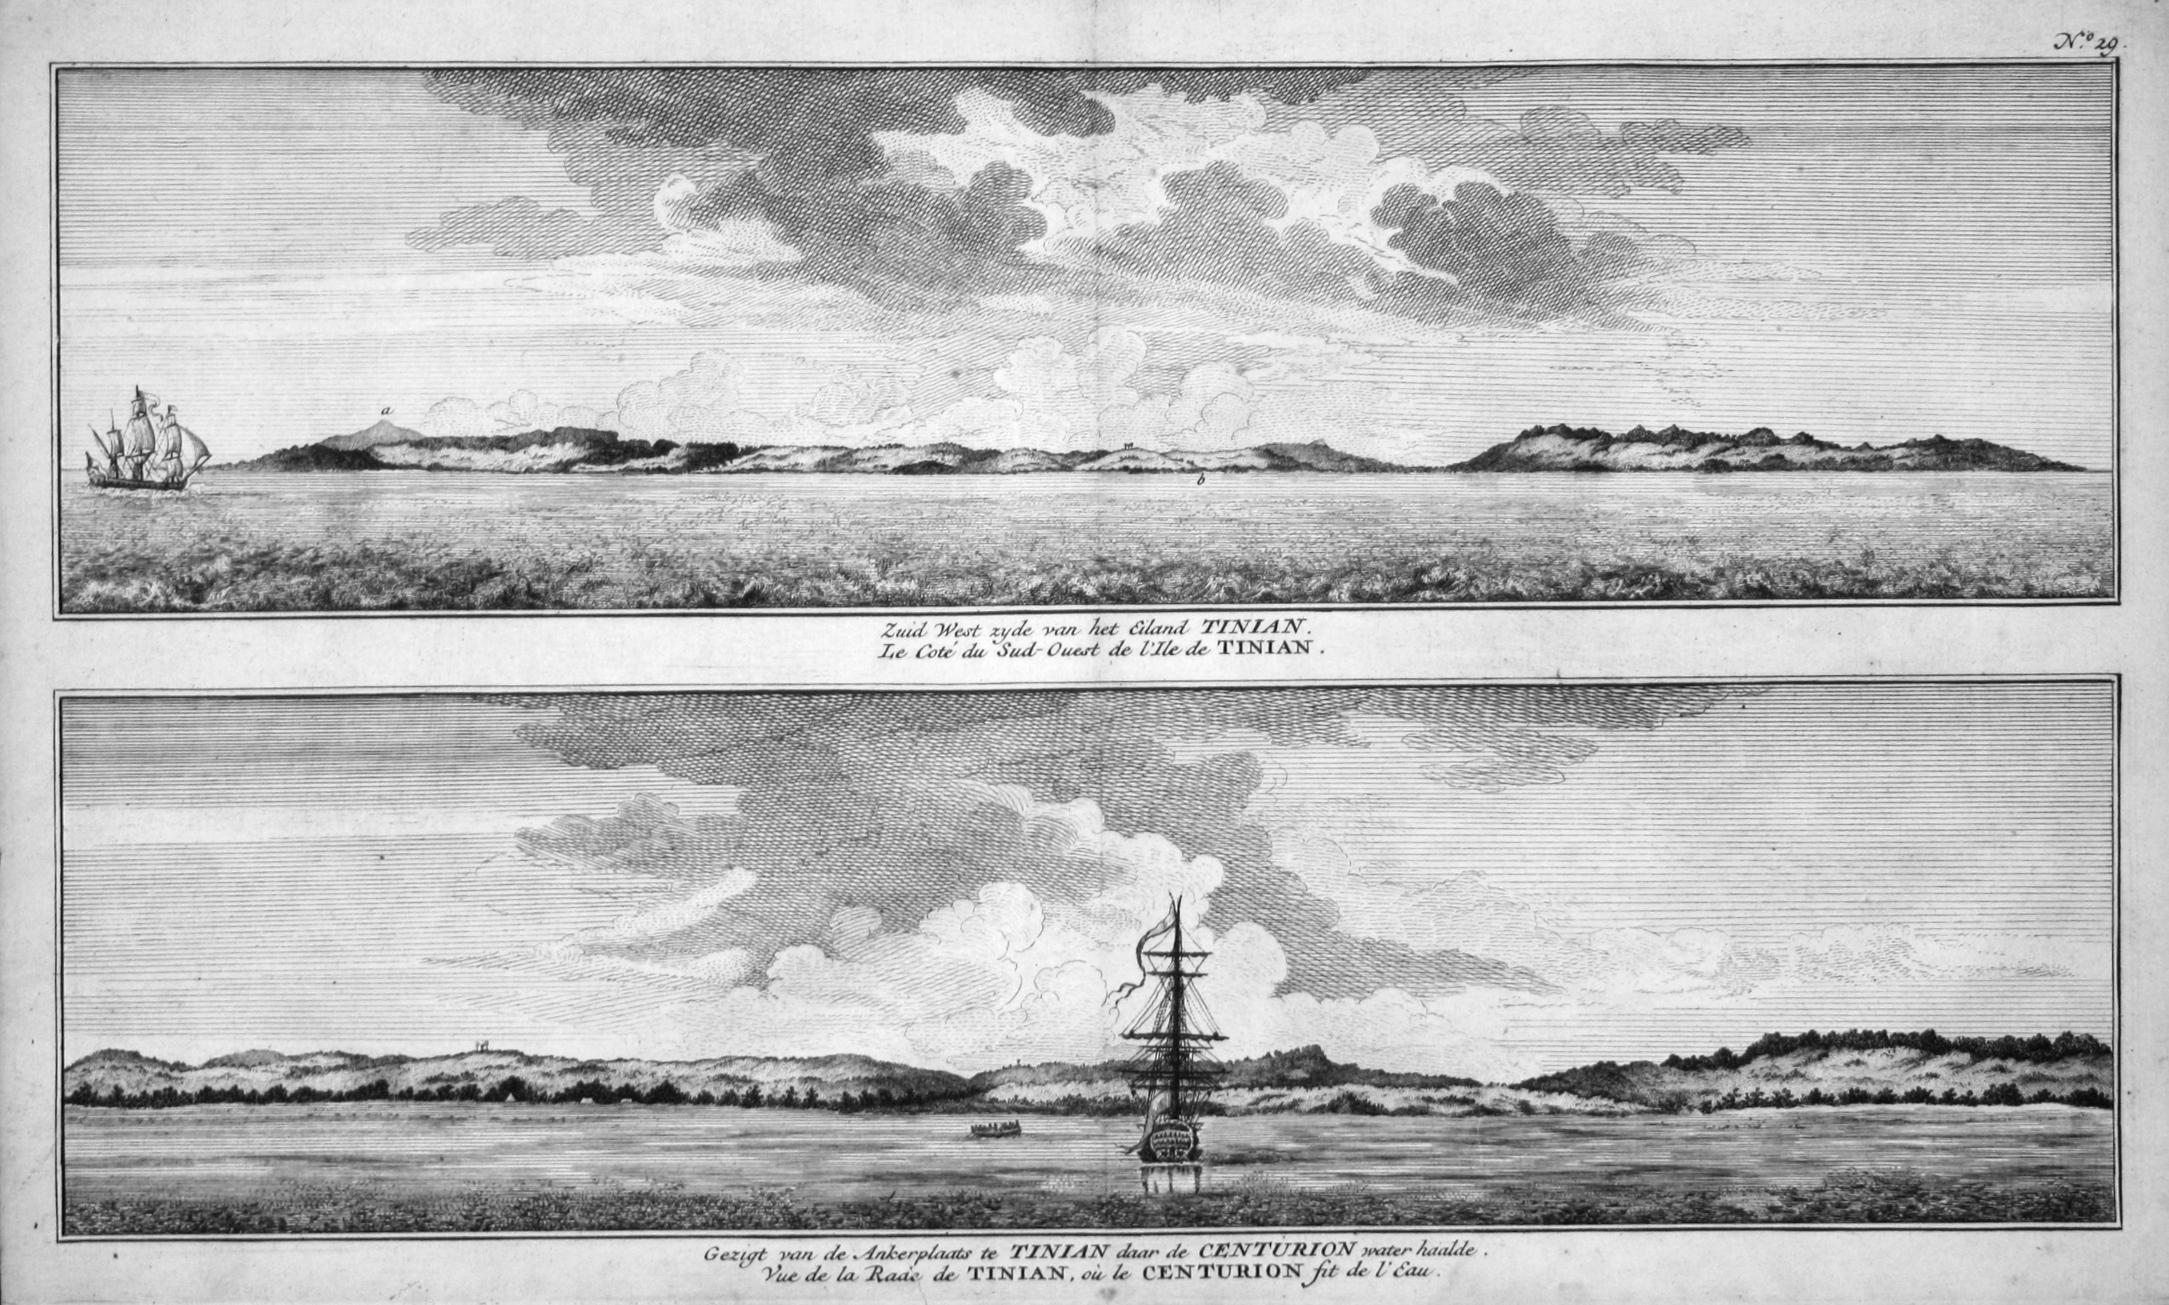 "Zuid West zyde van het Eiland Tinian"": Anson, George:"